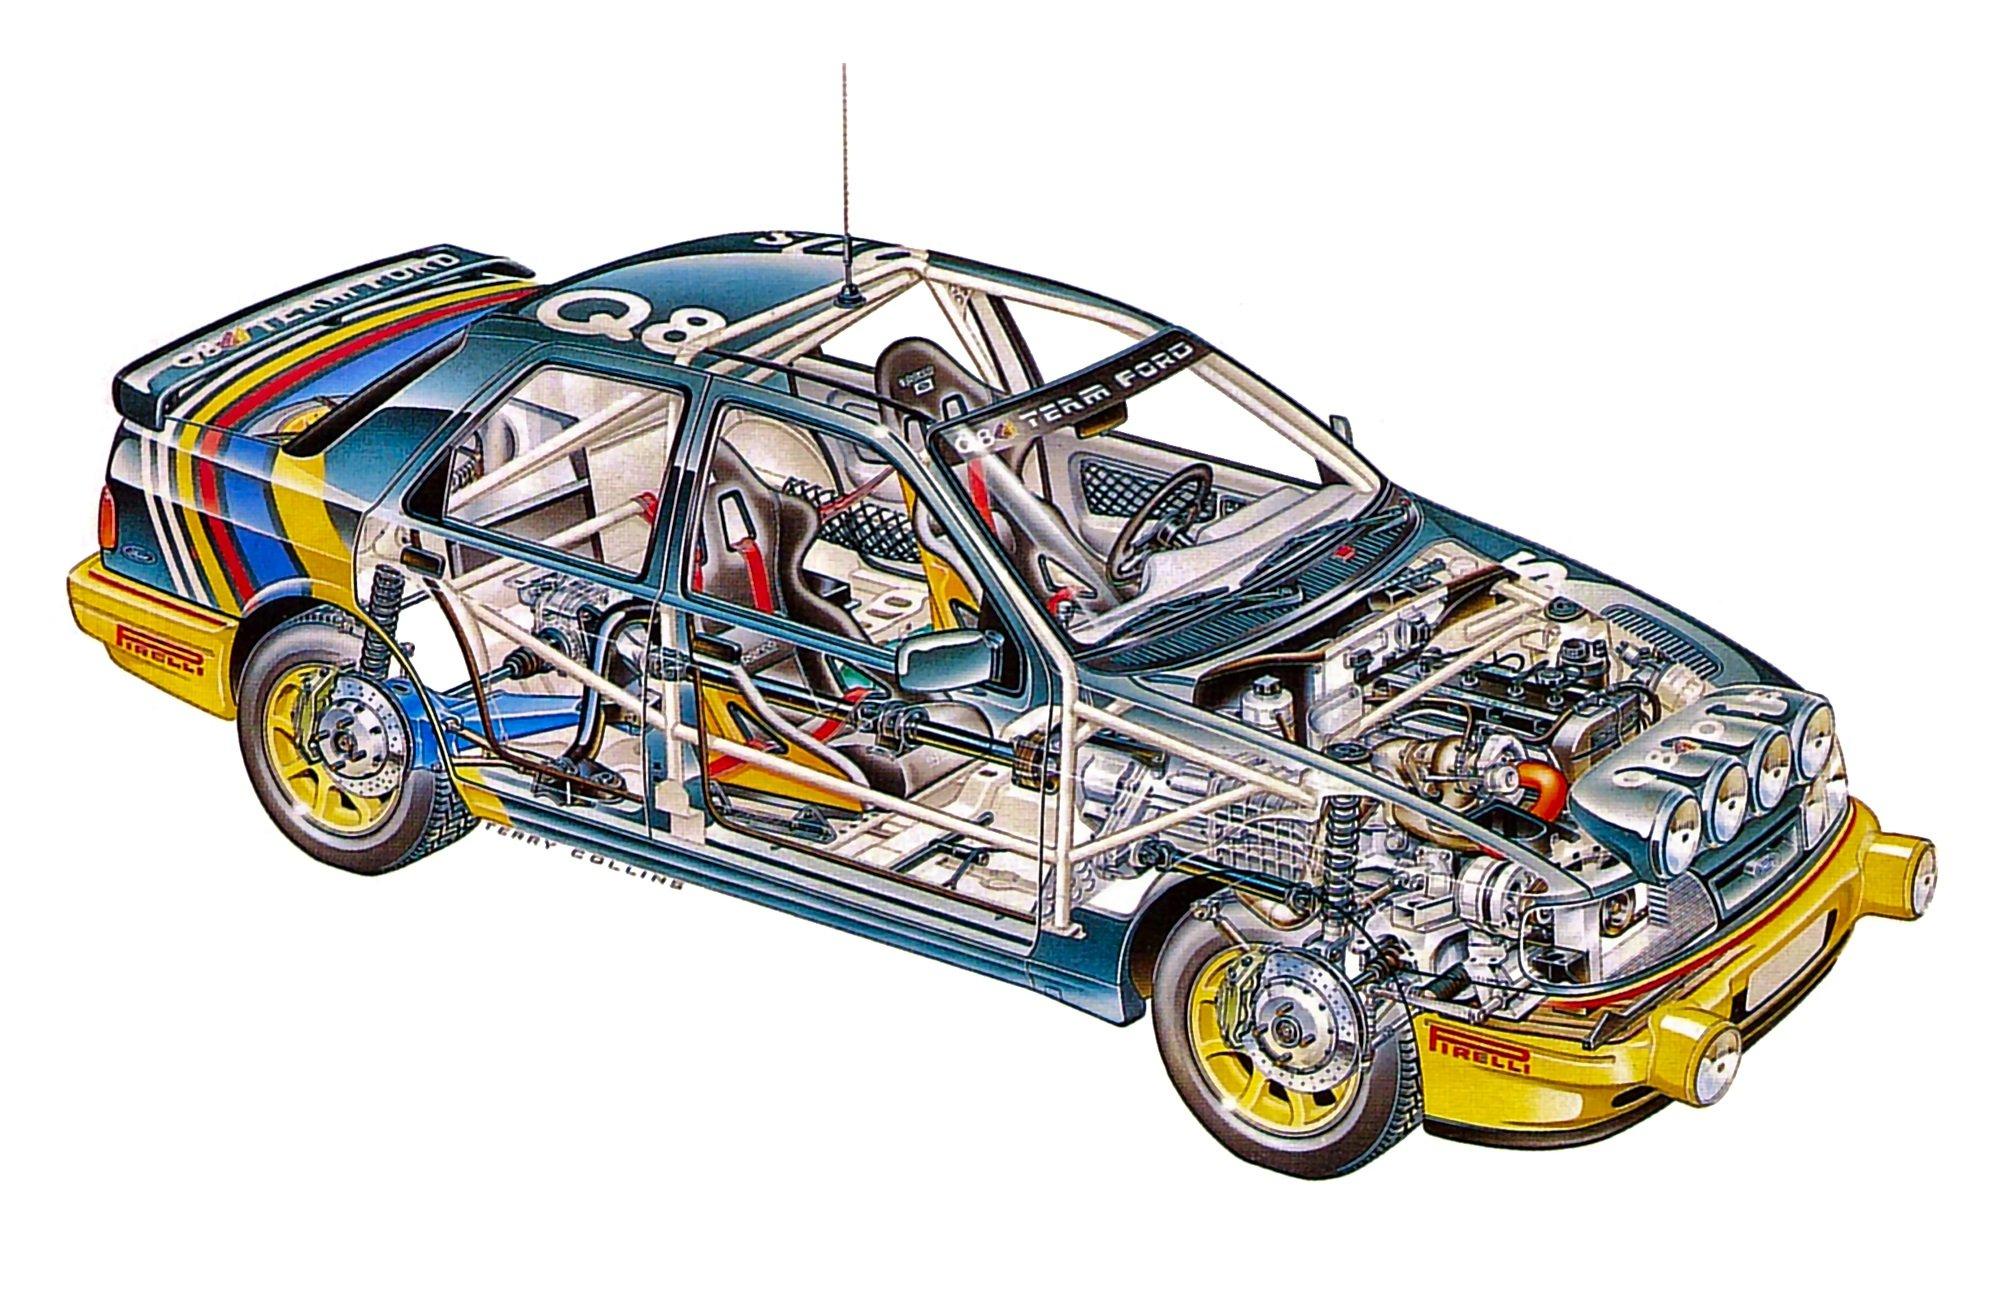 Ford Sierra Cosworth Cars Rally Technical Cutaway